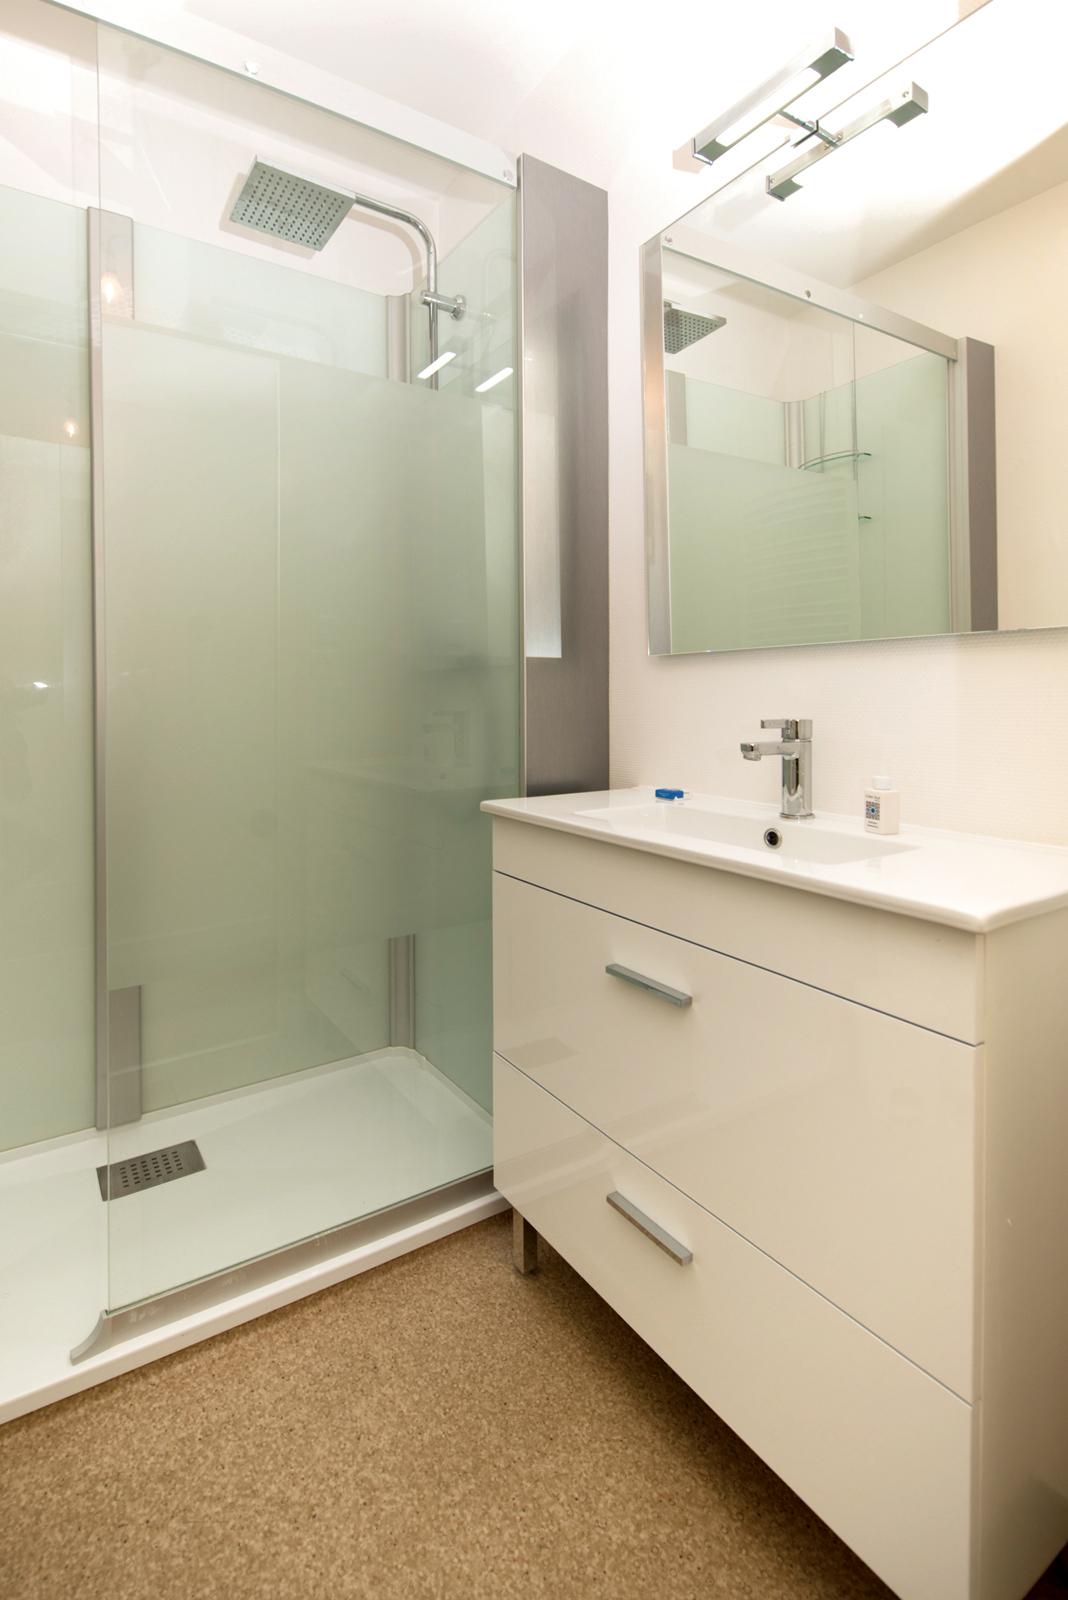 Salle De Bain Dax salle de bain studio 2 personnes -